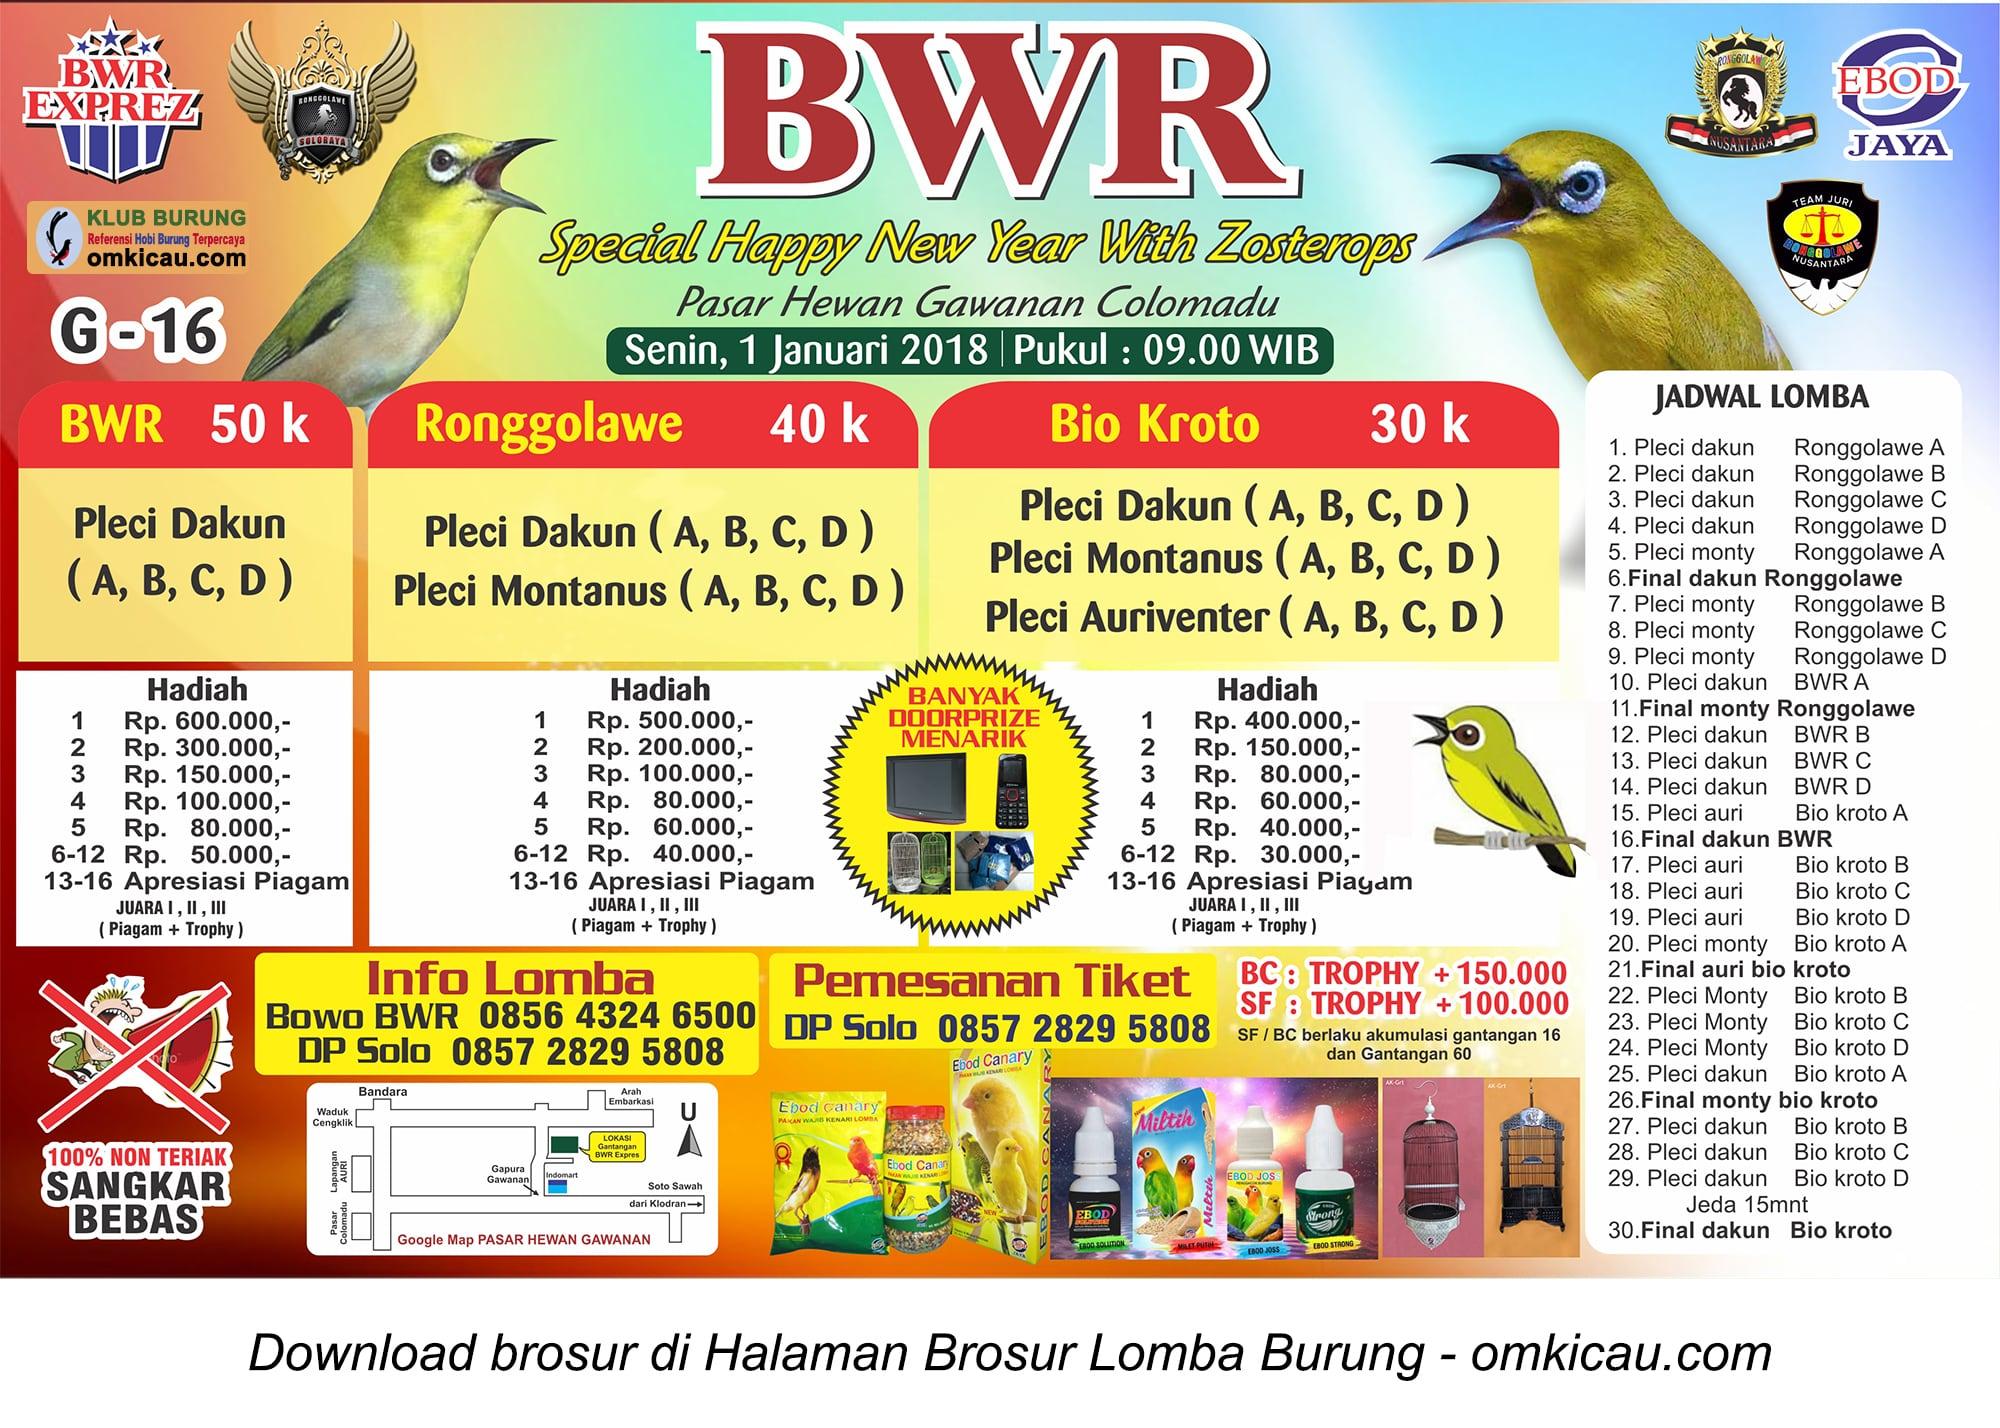 kontes pleci BWR Special Happy New Year